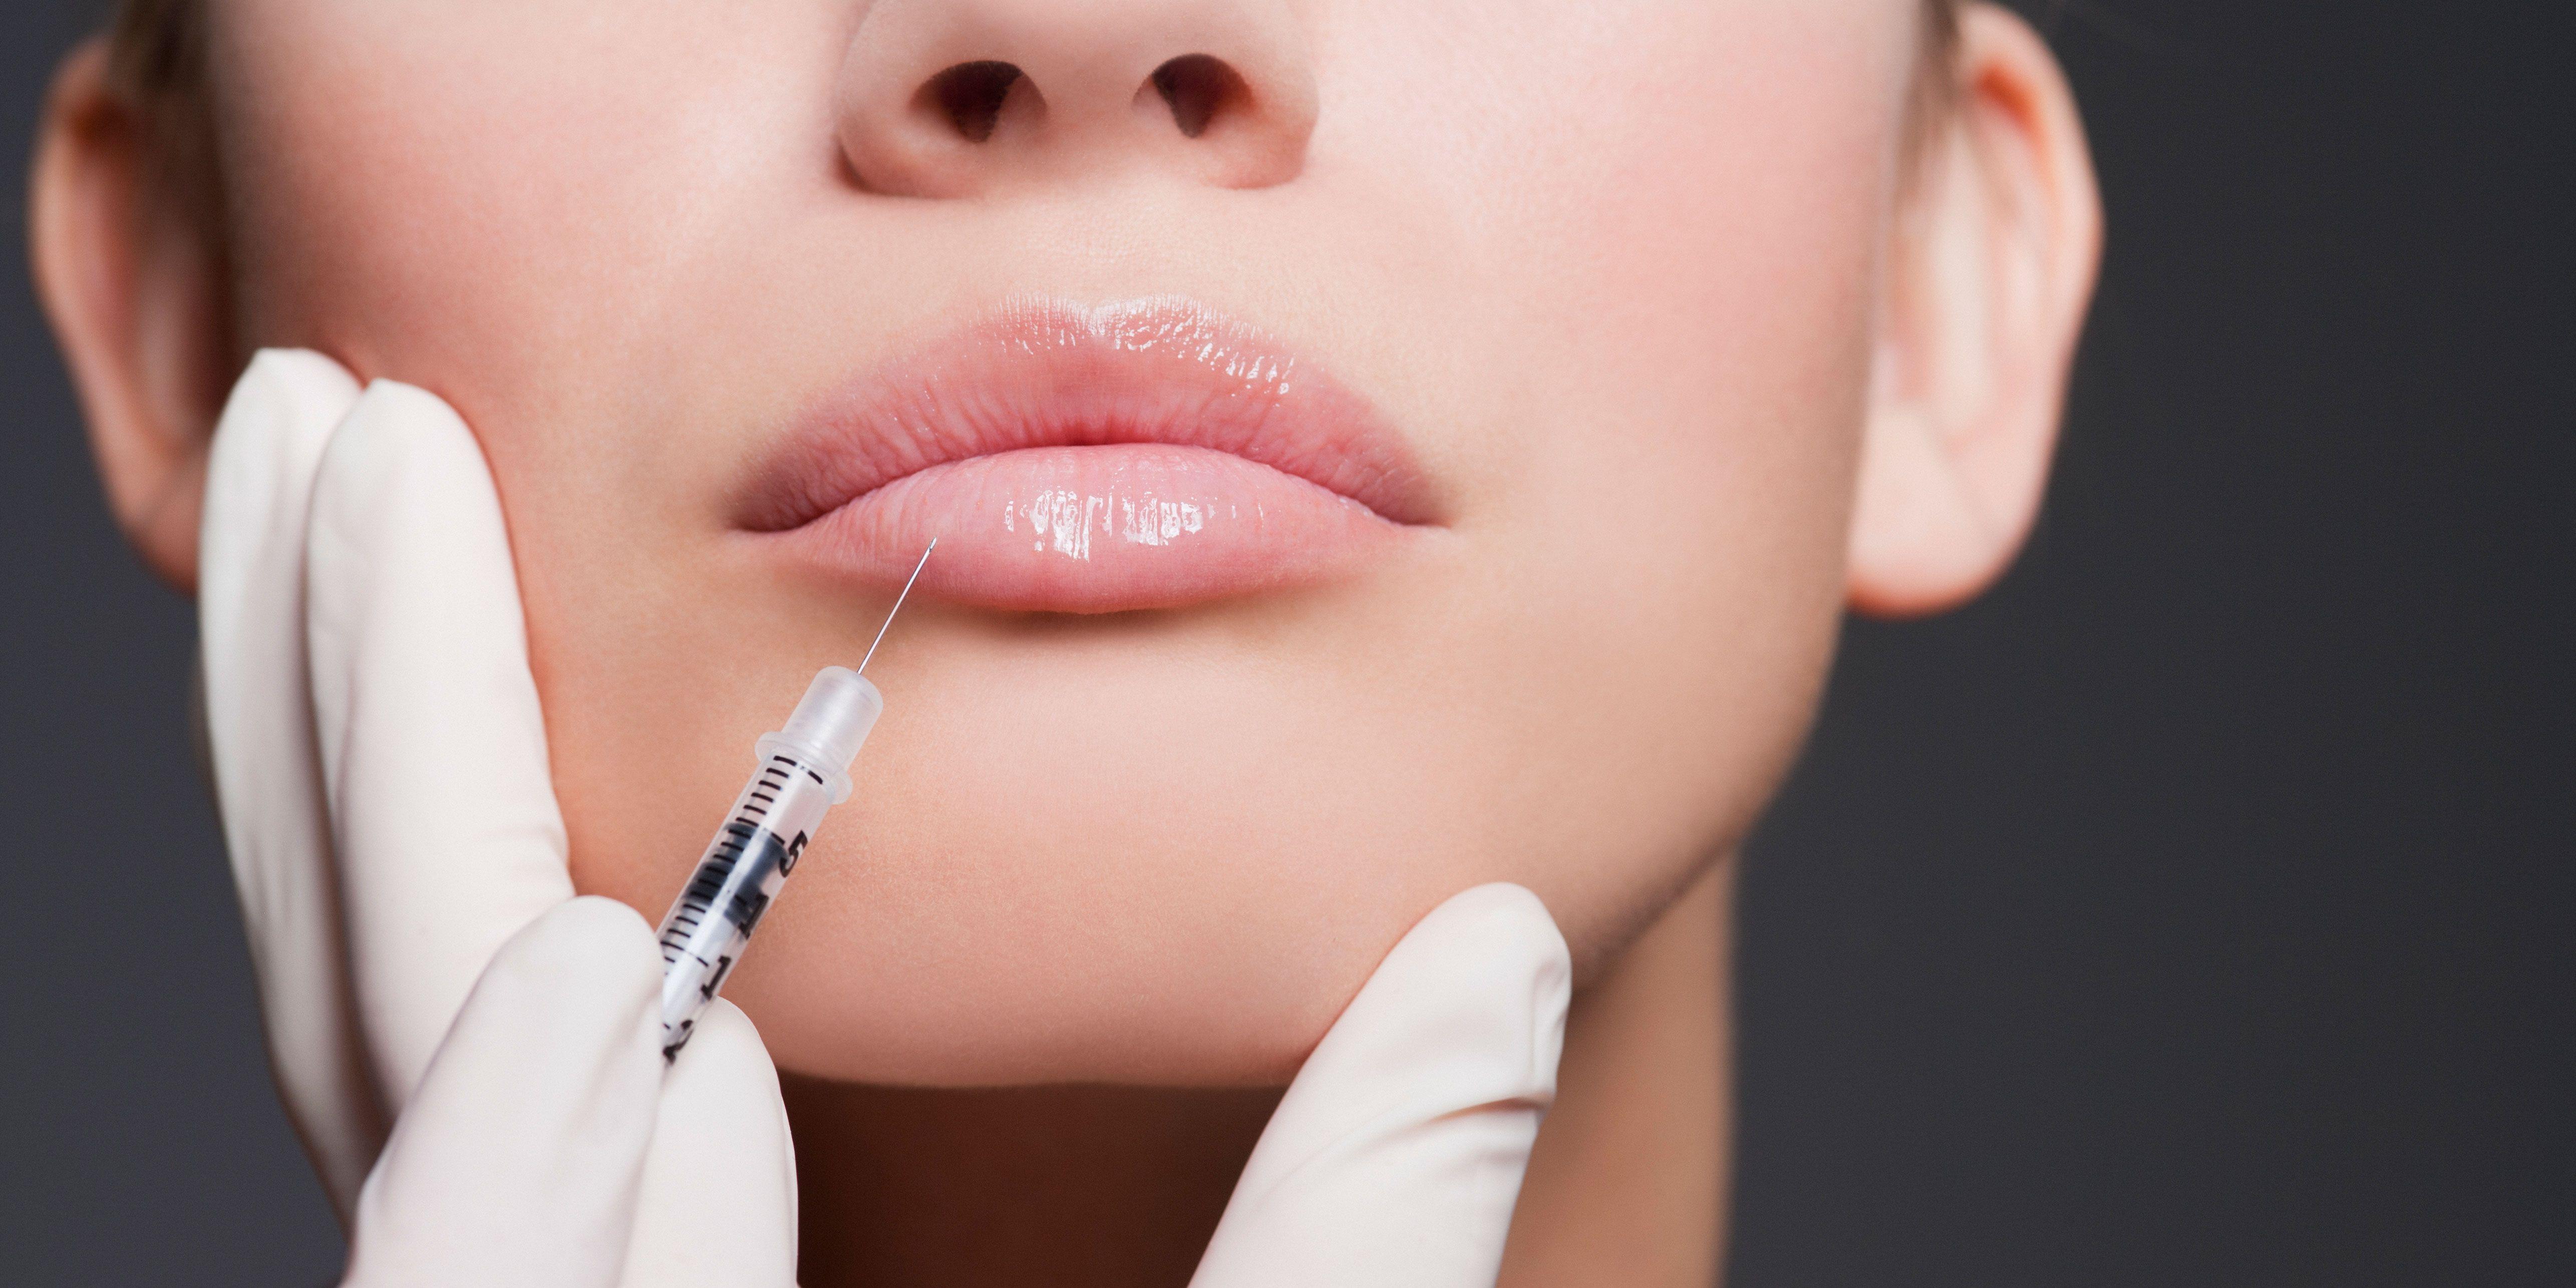 Are Lip Implants Safe